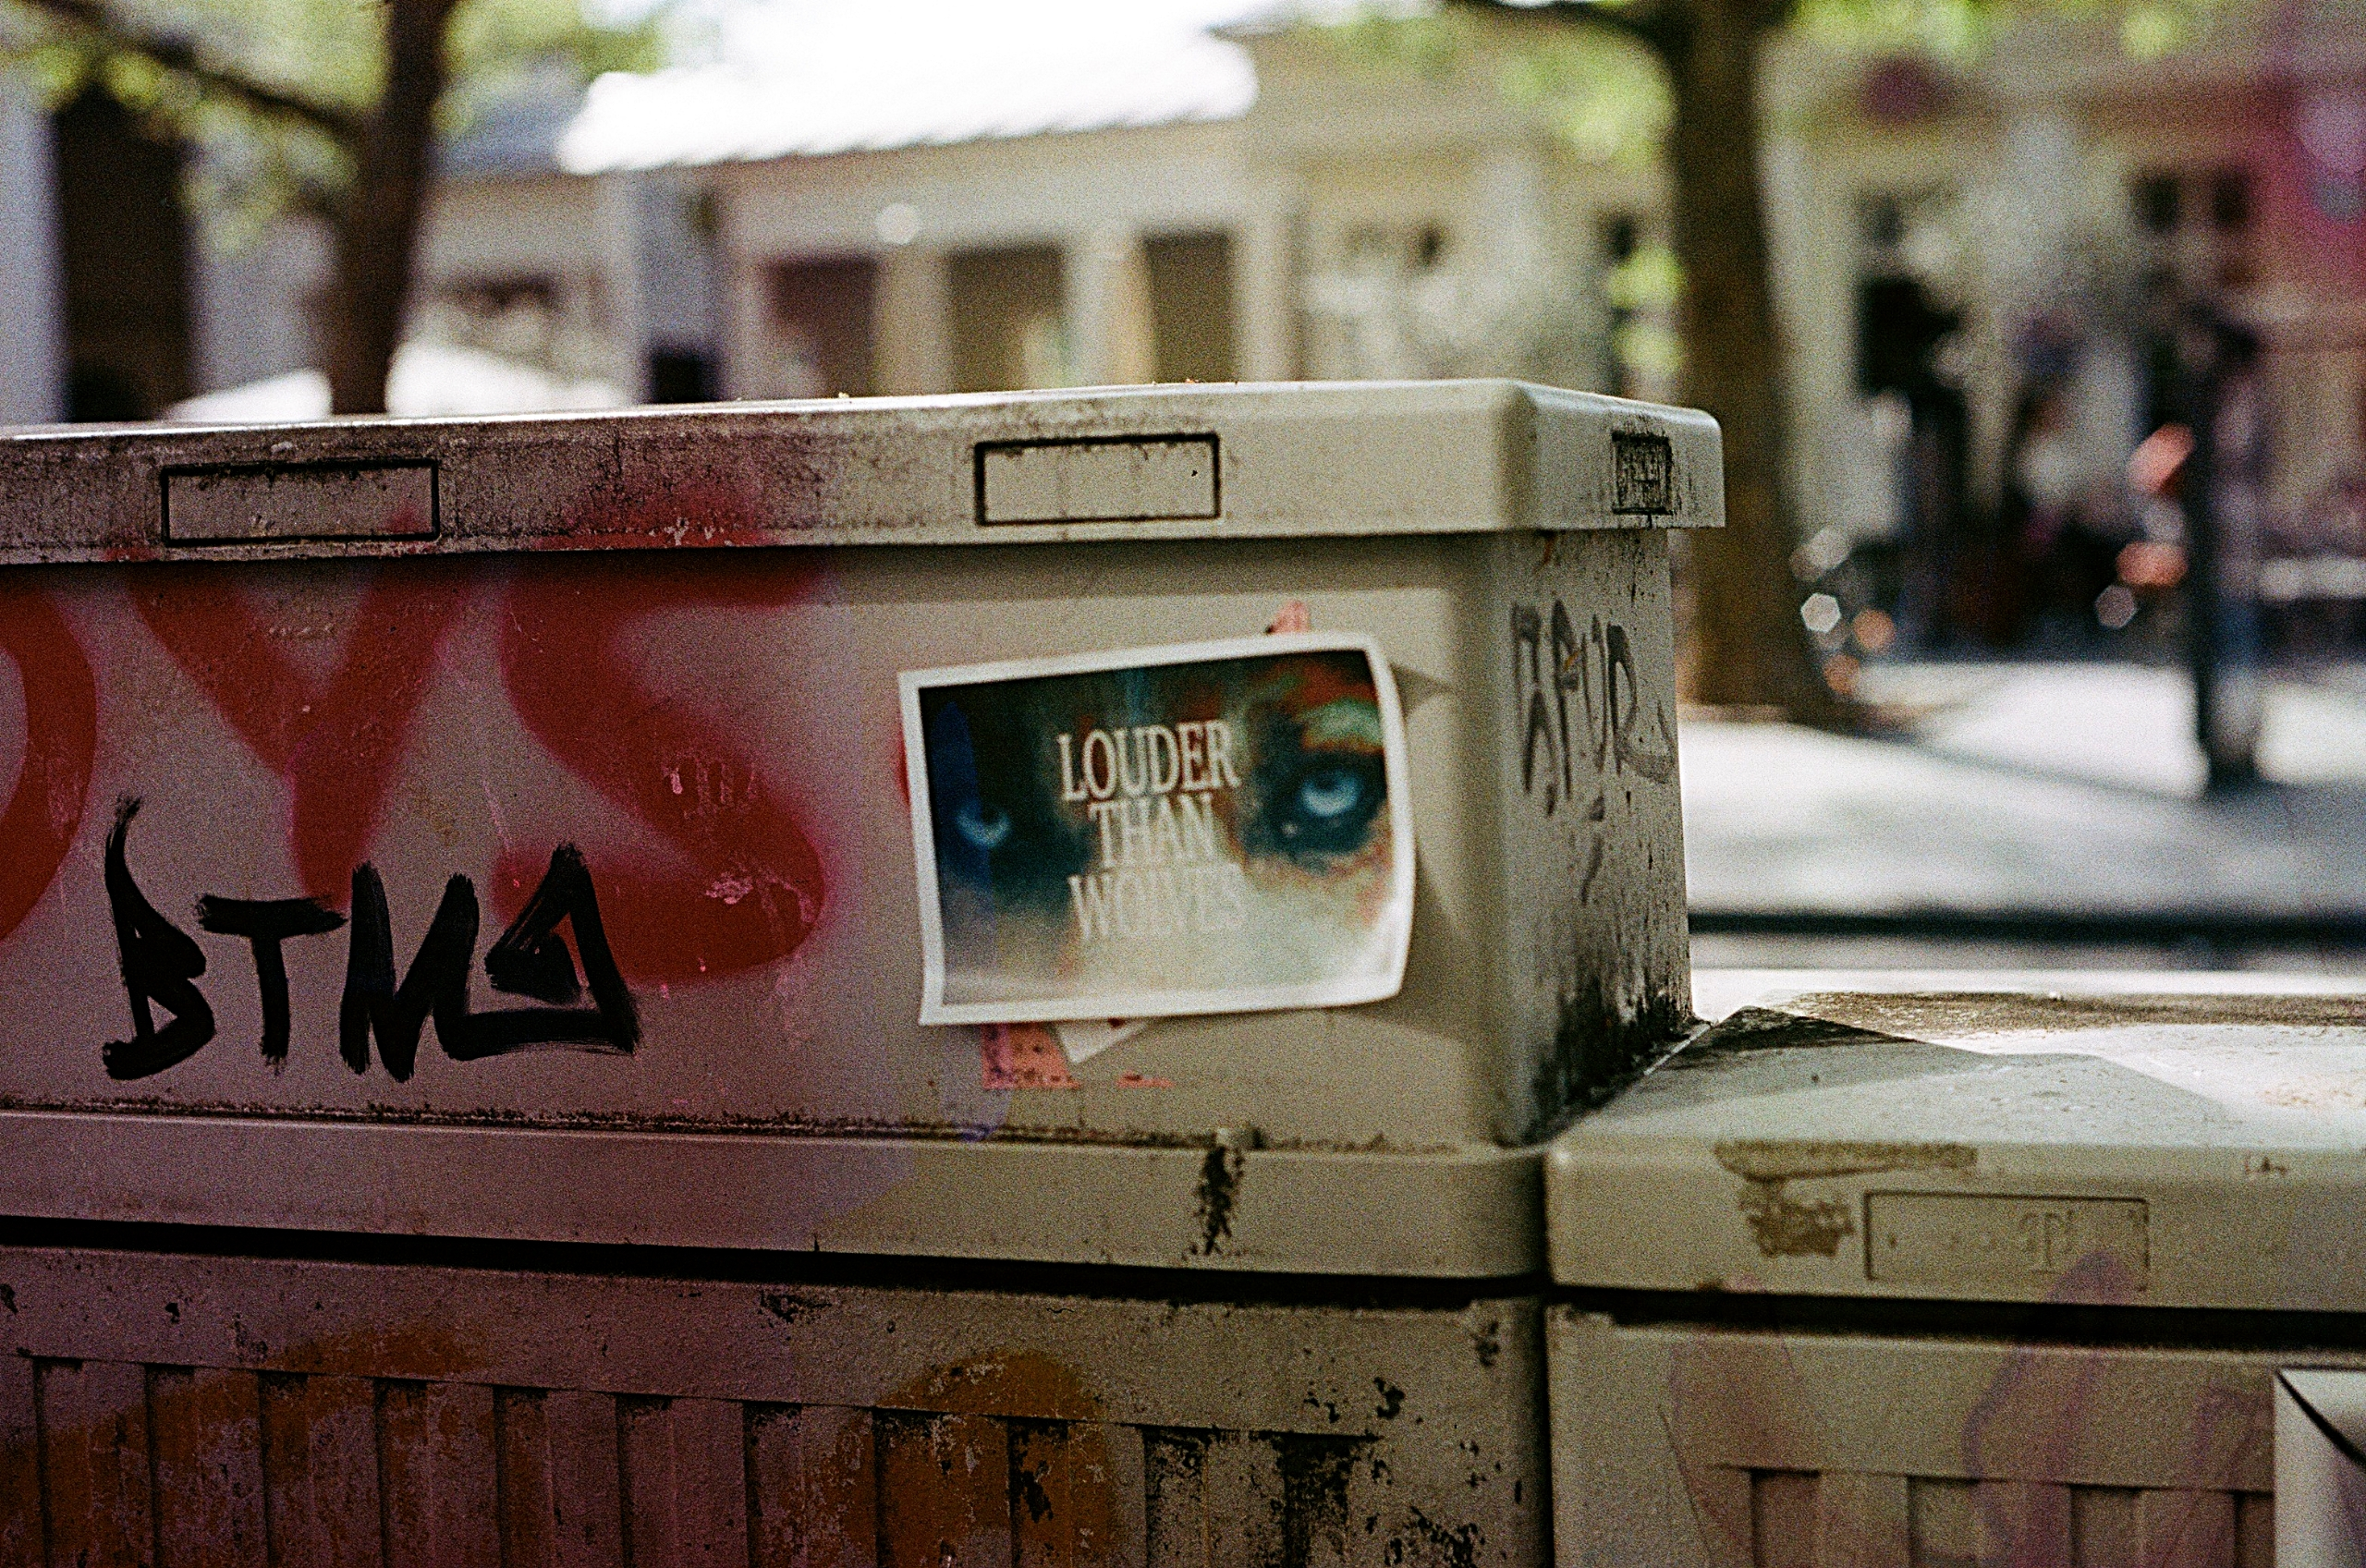 [Vodka] Kodak: Sticker Experime - walter_ac | ello